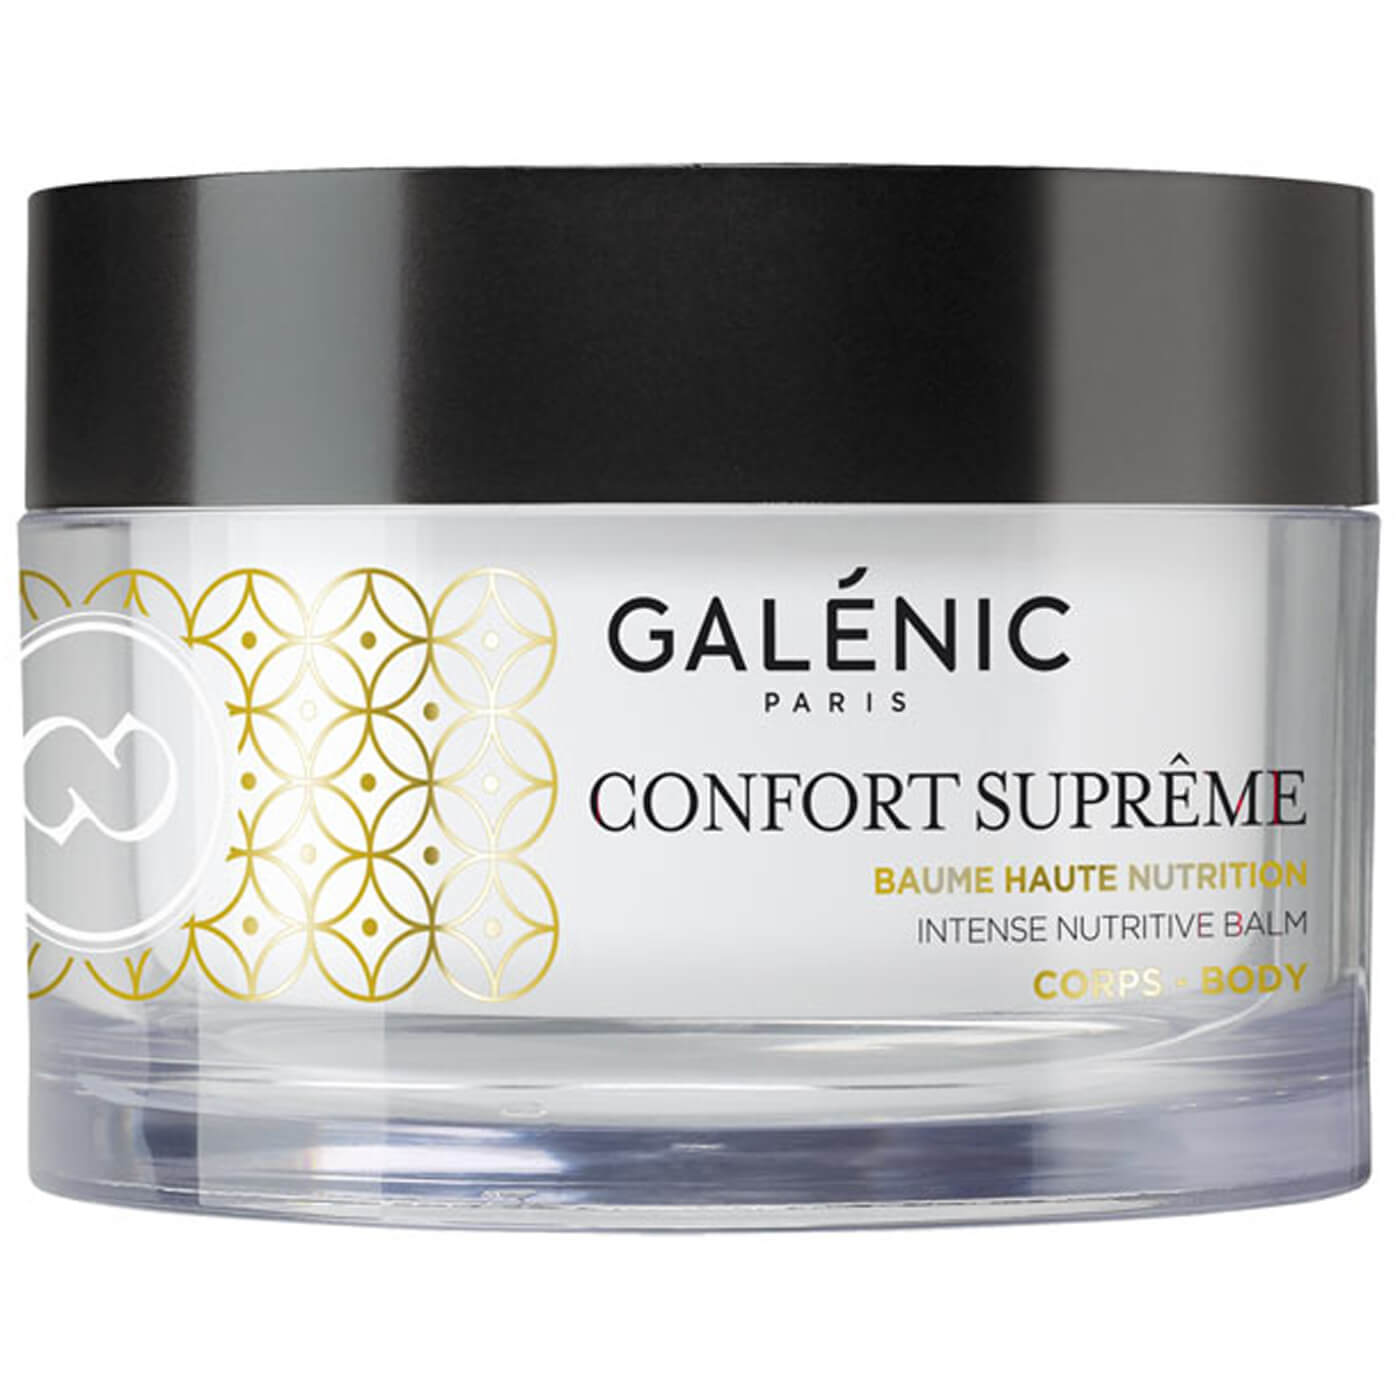 Galenic Confort Supreme Baume Haute Nutrition Βάλσαμο Εντατικής Θρέψης για το Σώμα με Ξεχωριστό Άρωμα 200ml